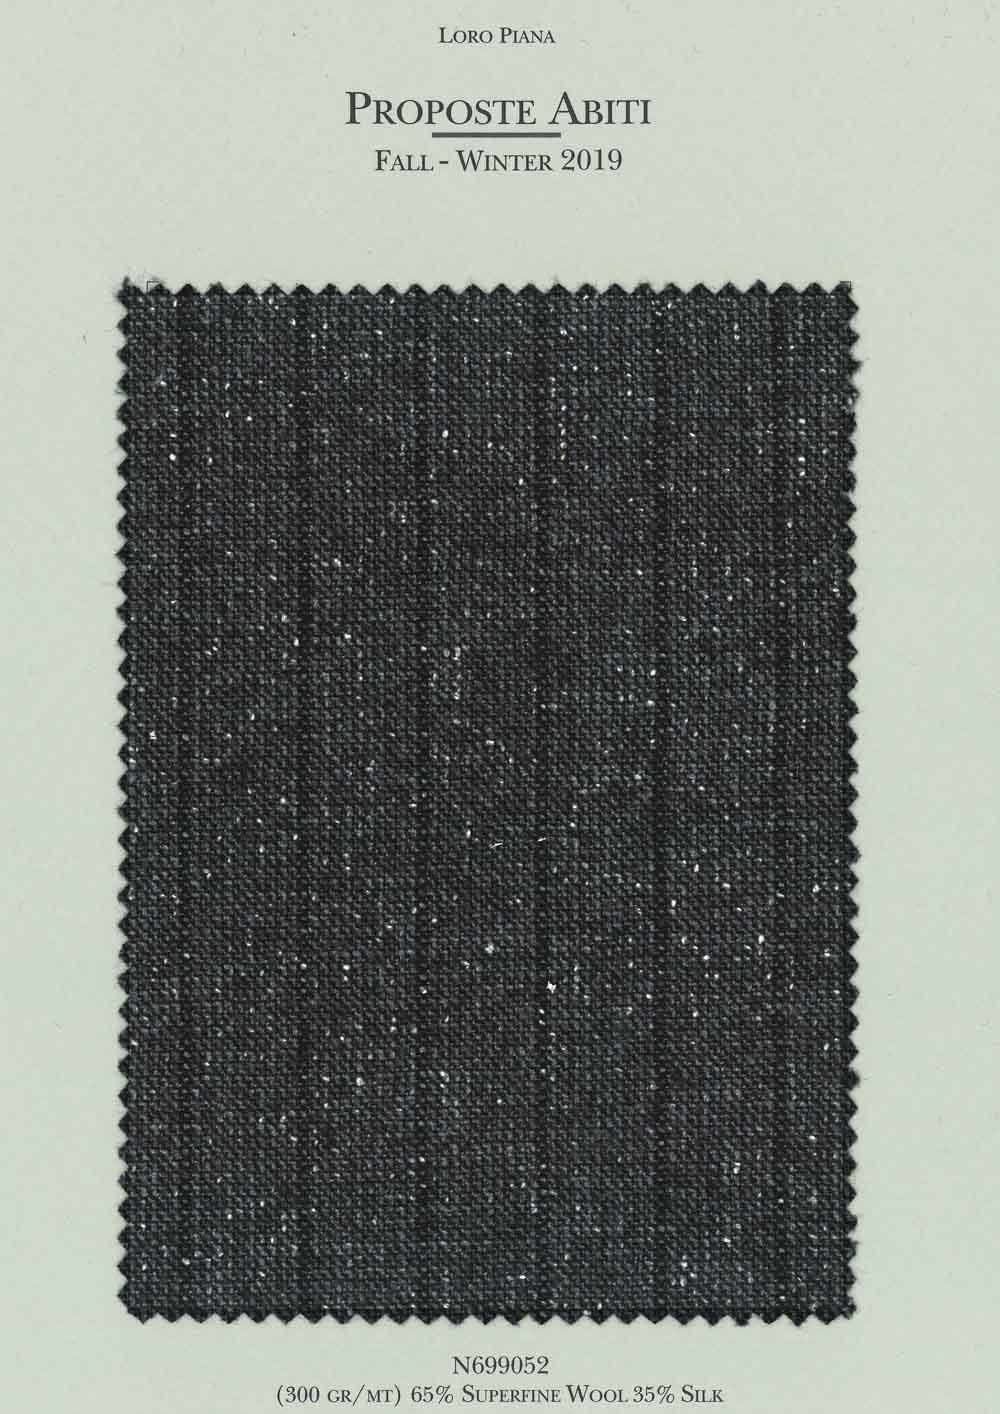 Lpn699052